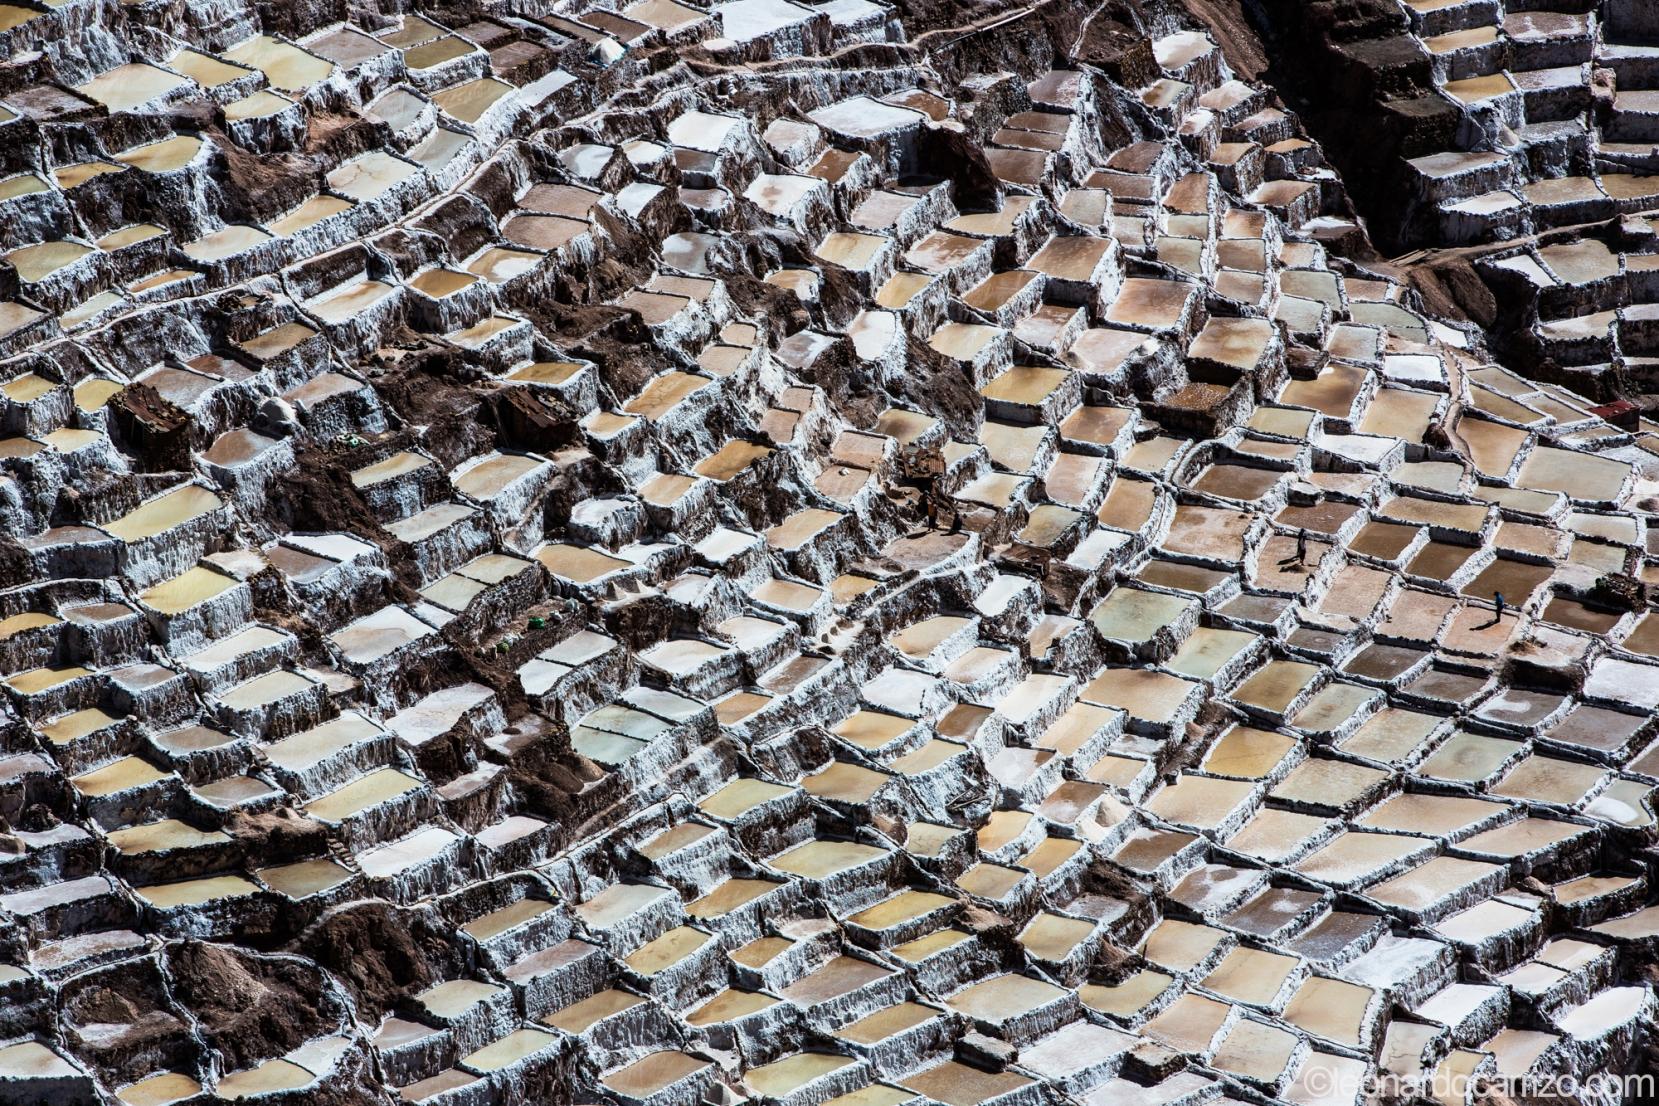 Inca salt mines in Maras, Sacred Valley, Peru. photo by Leonardo Carrizo